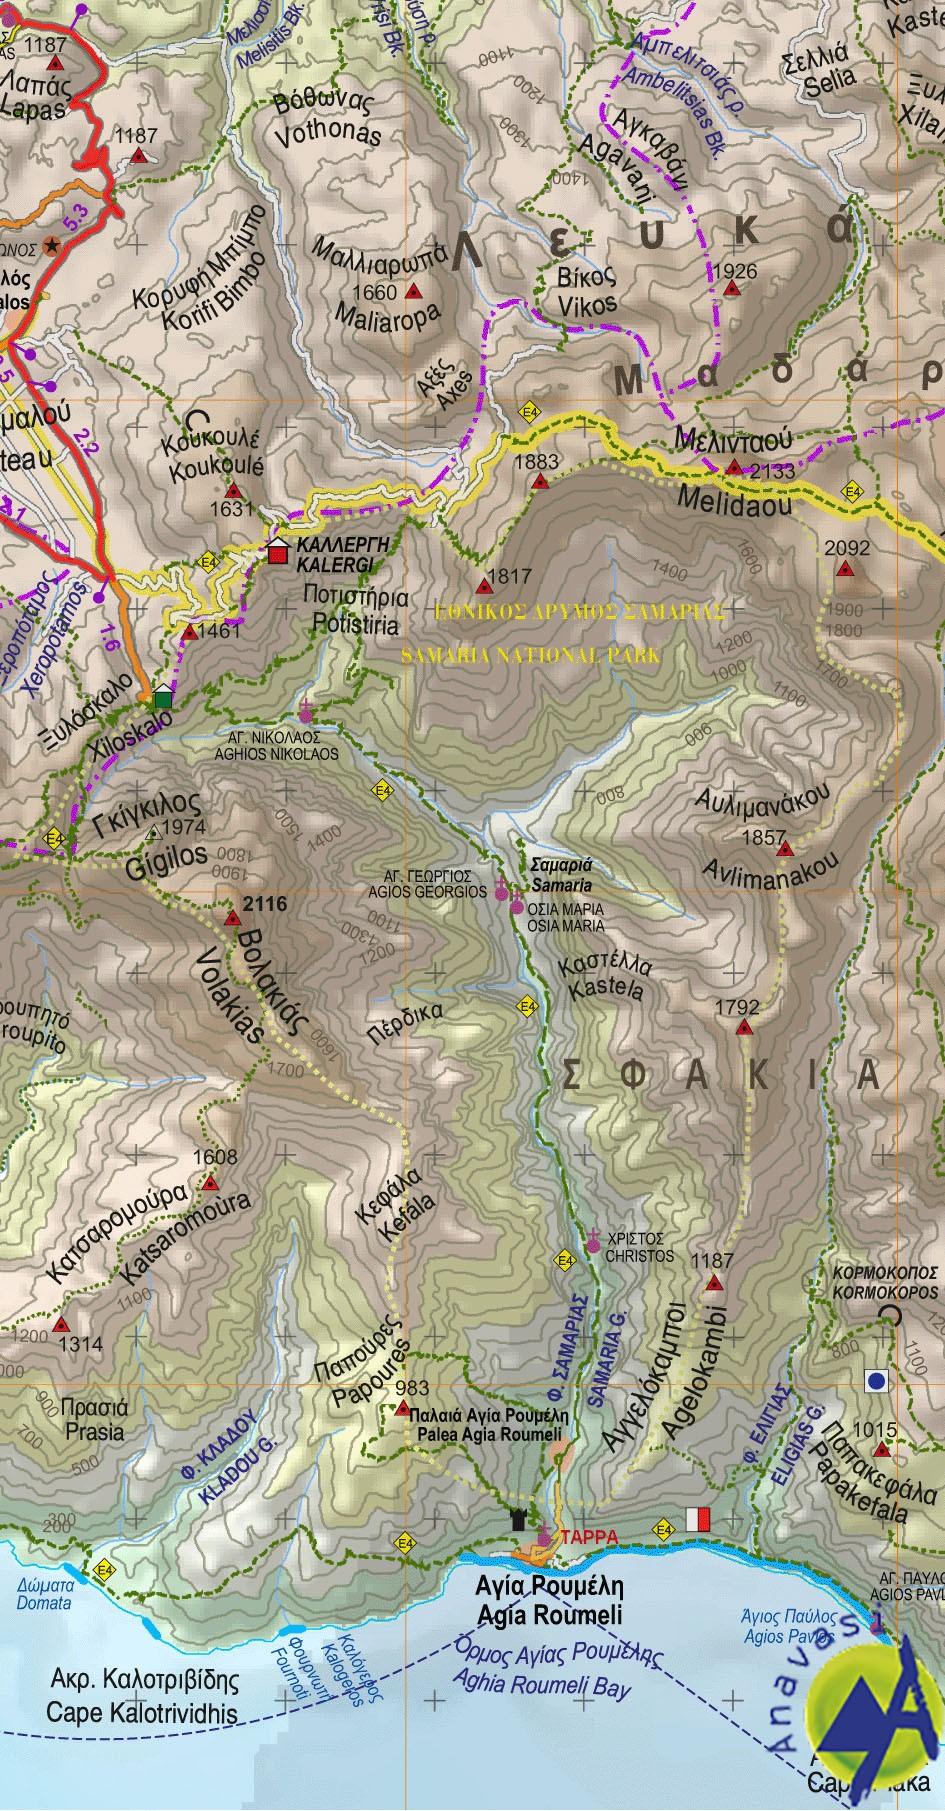 Chania - Gavdos  • Road map 1:100000 - 1:20000